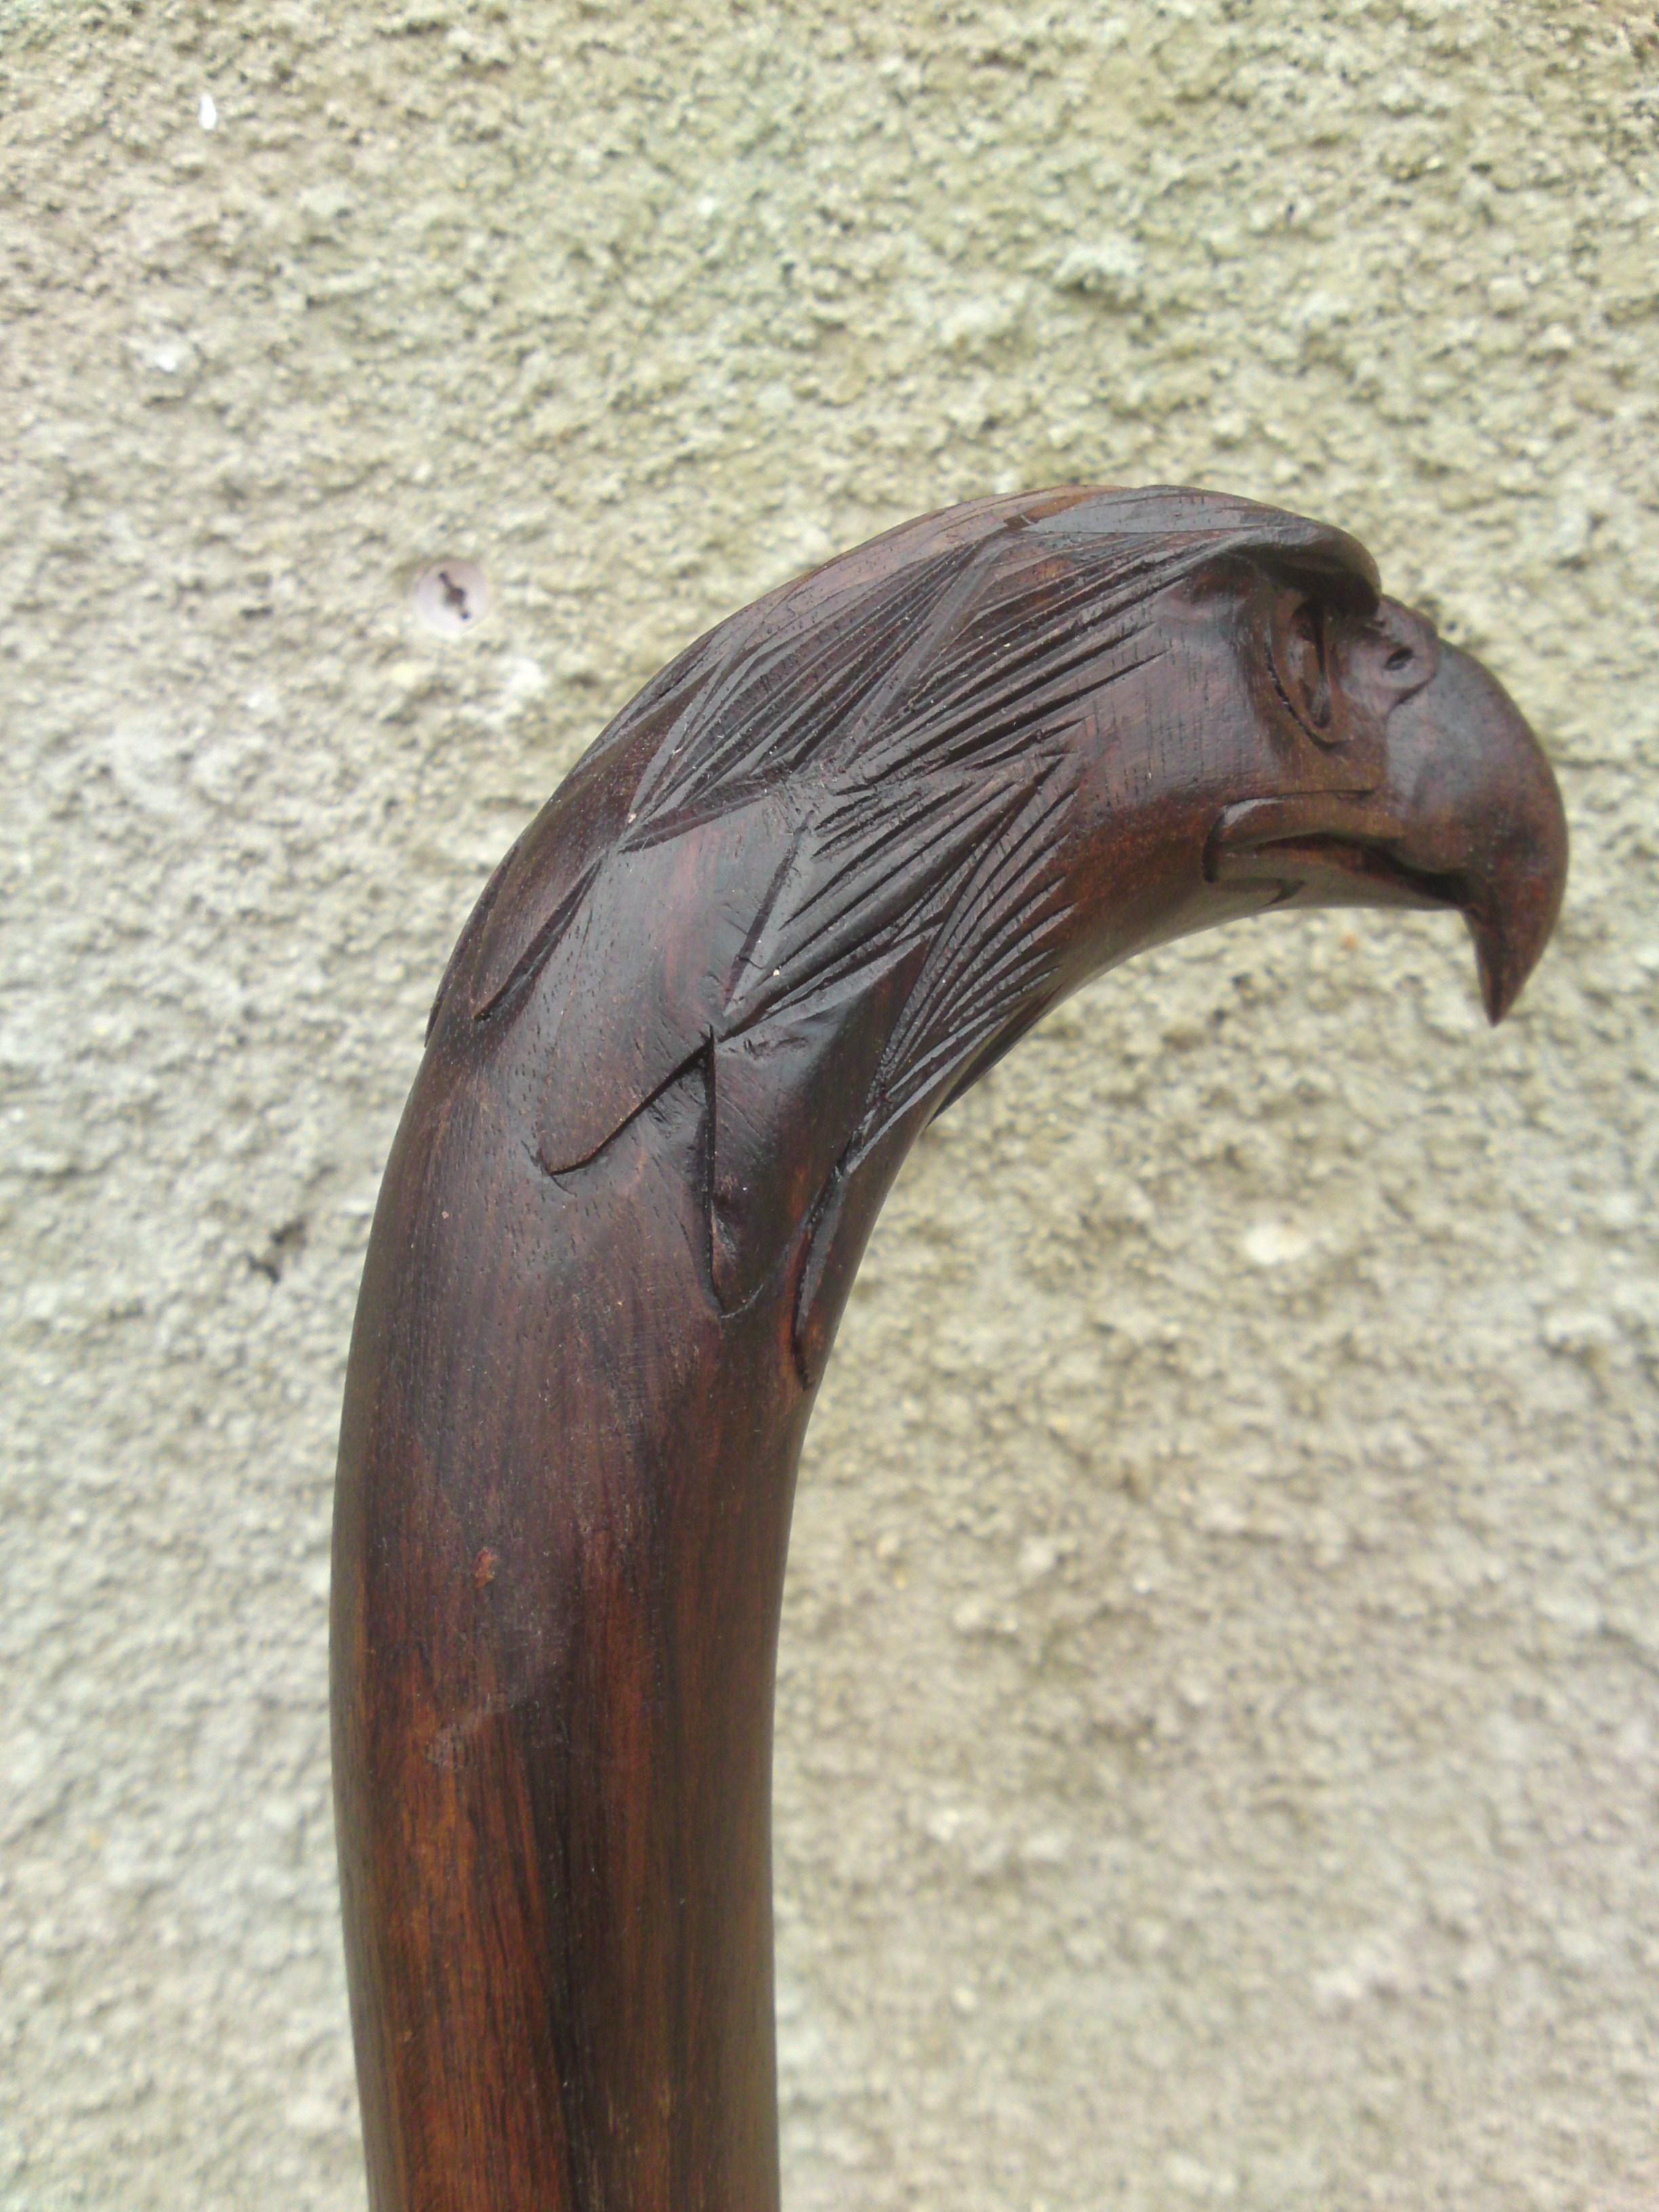 Eagle walking stick chiselcraft